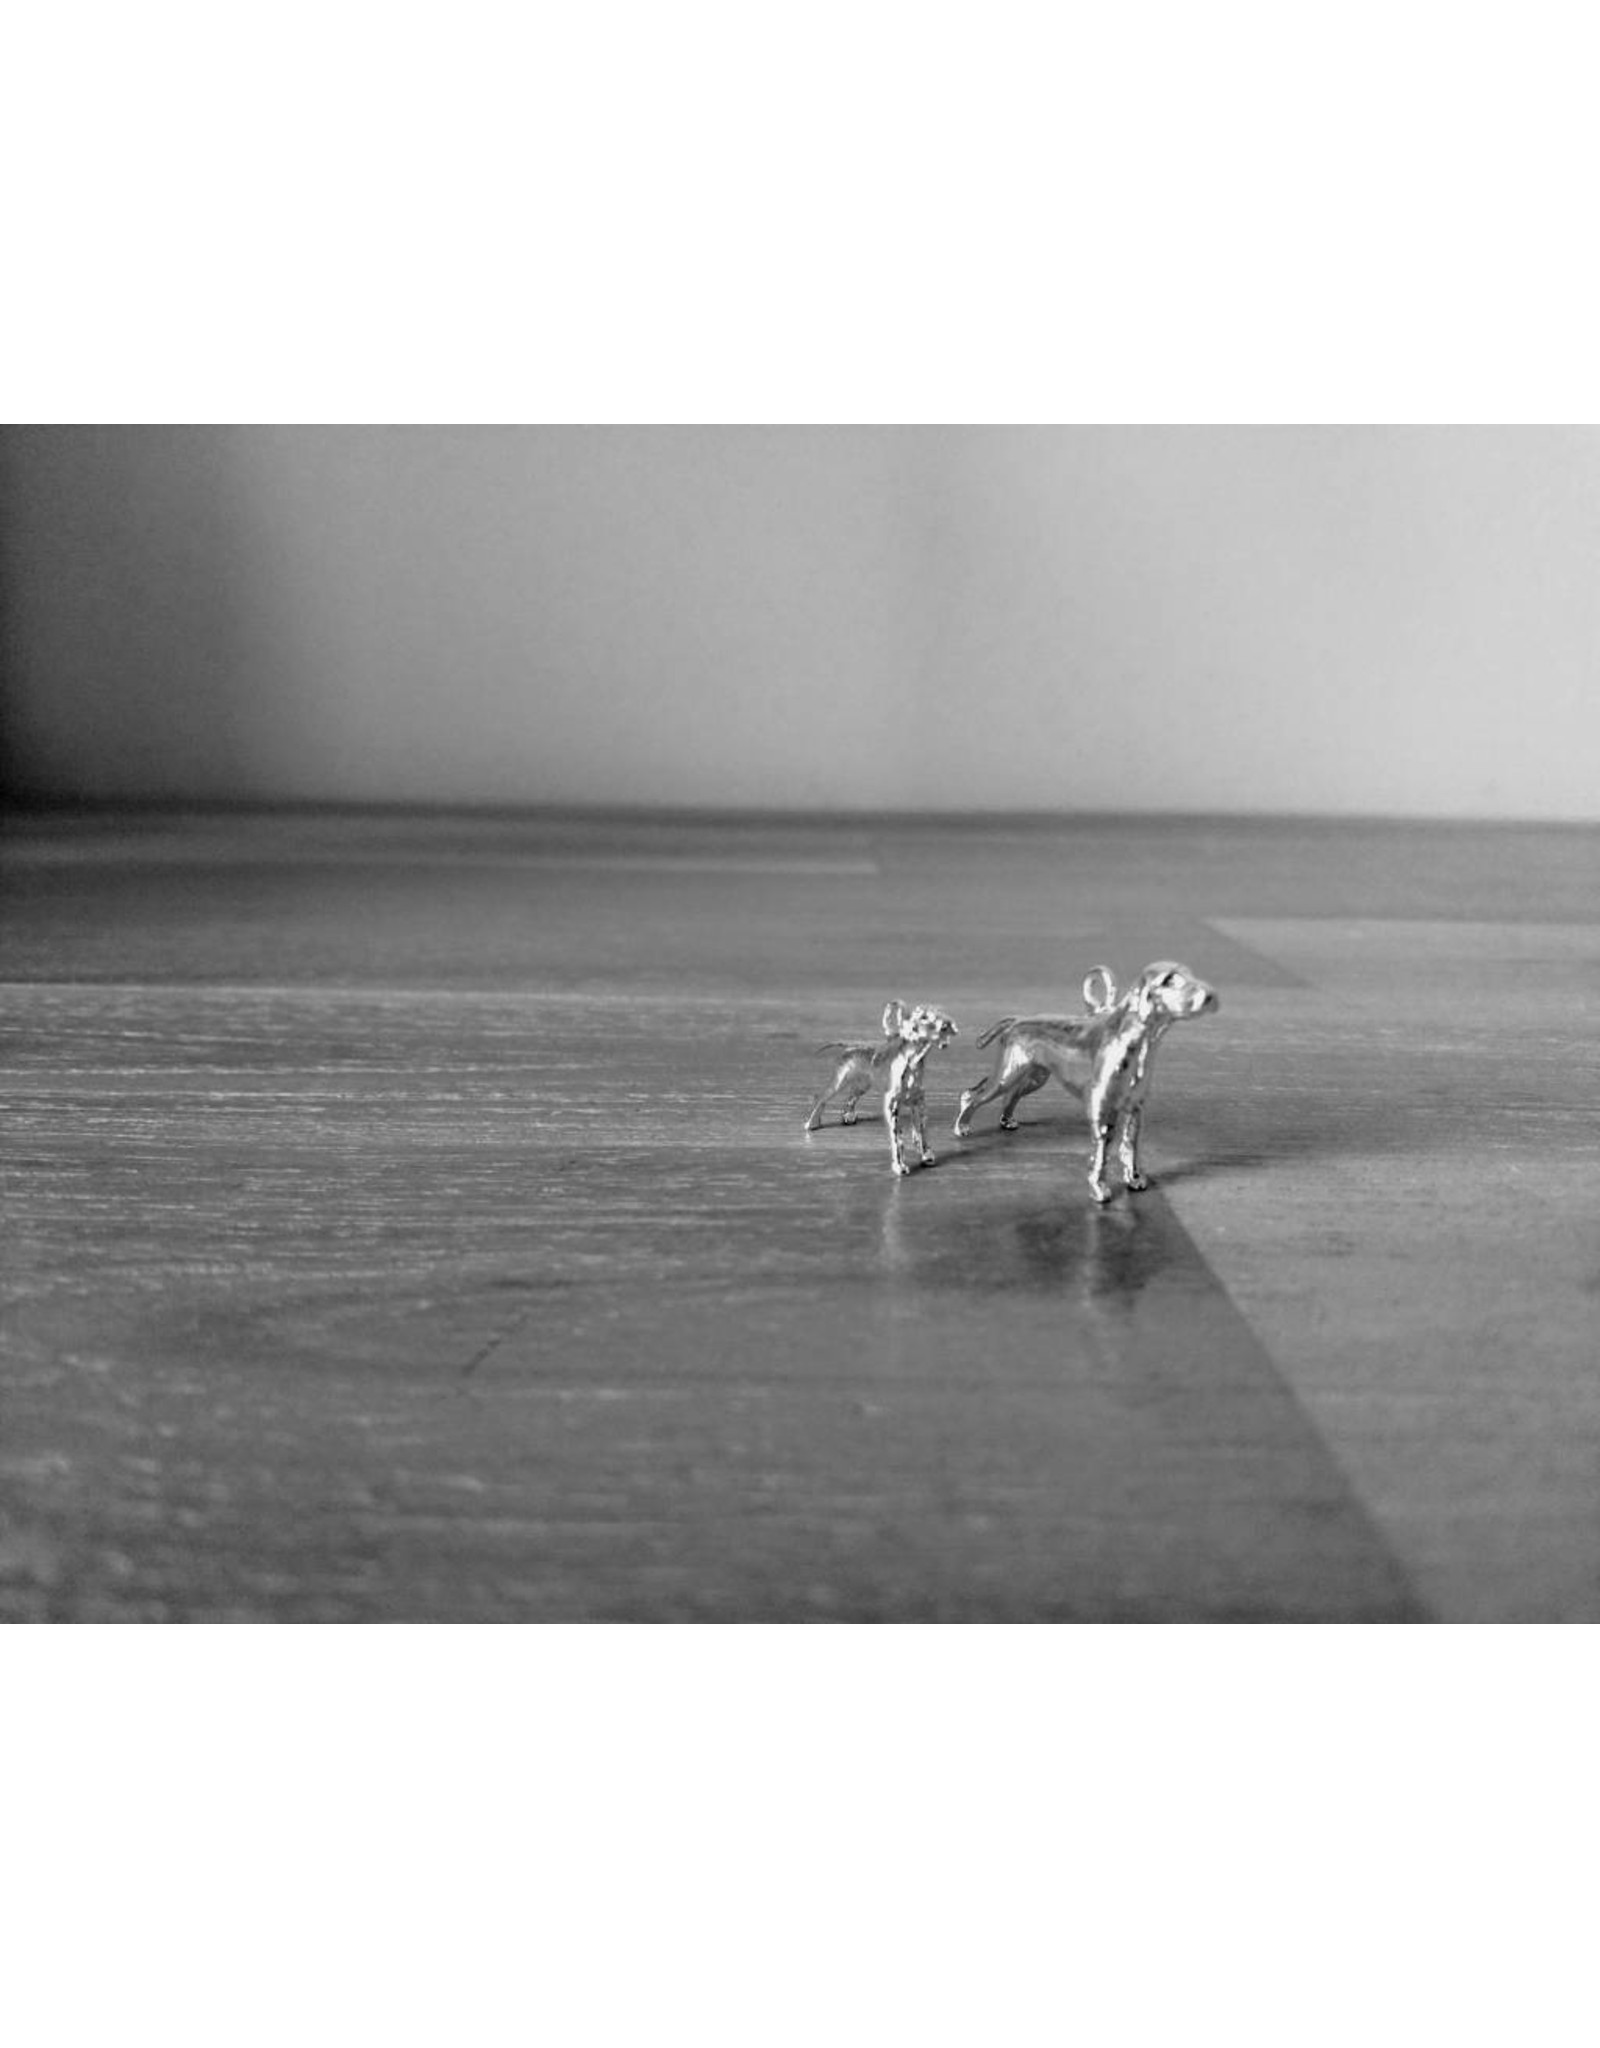 Handmade by Hanneke Weigel Zilveren Duitse staande korthaar